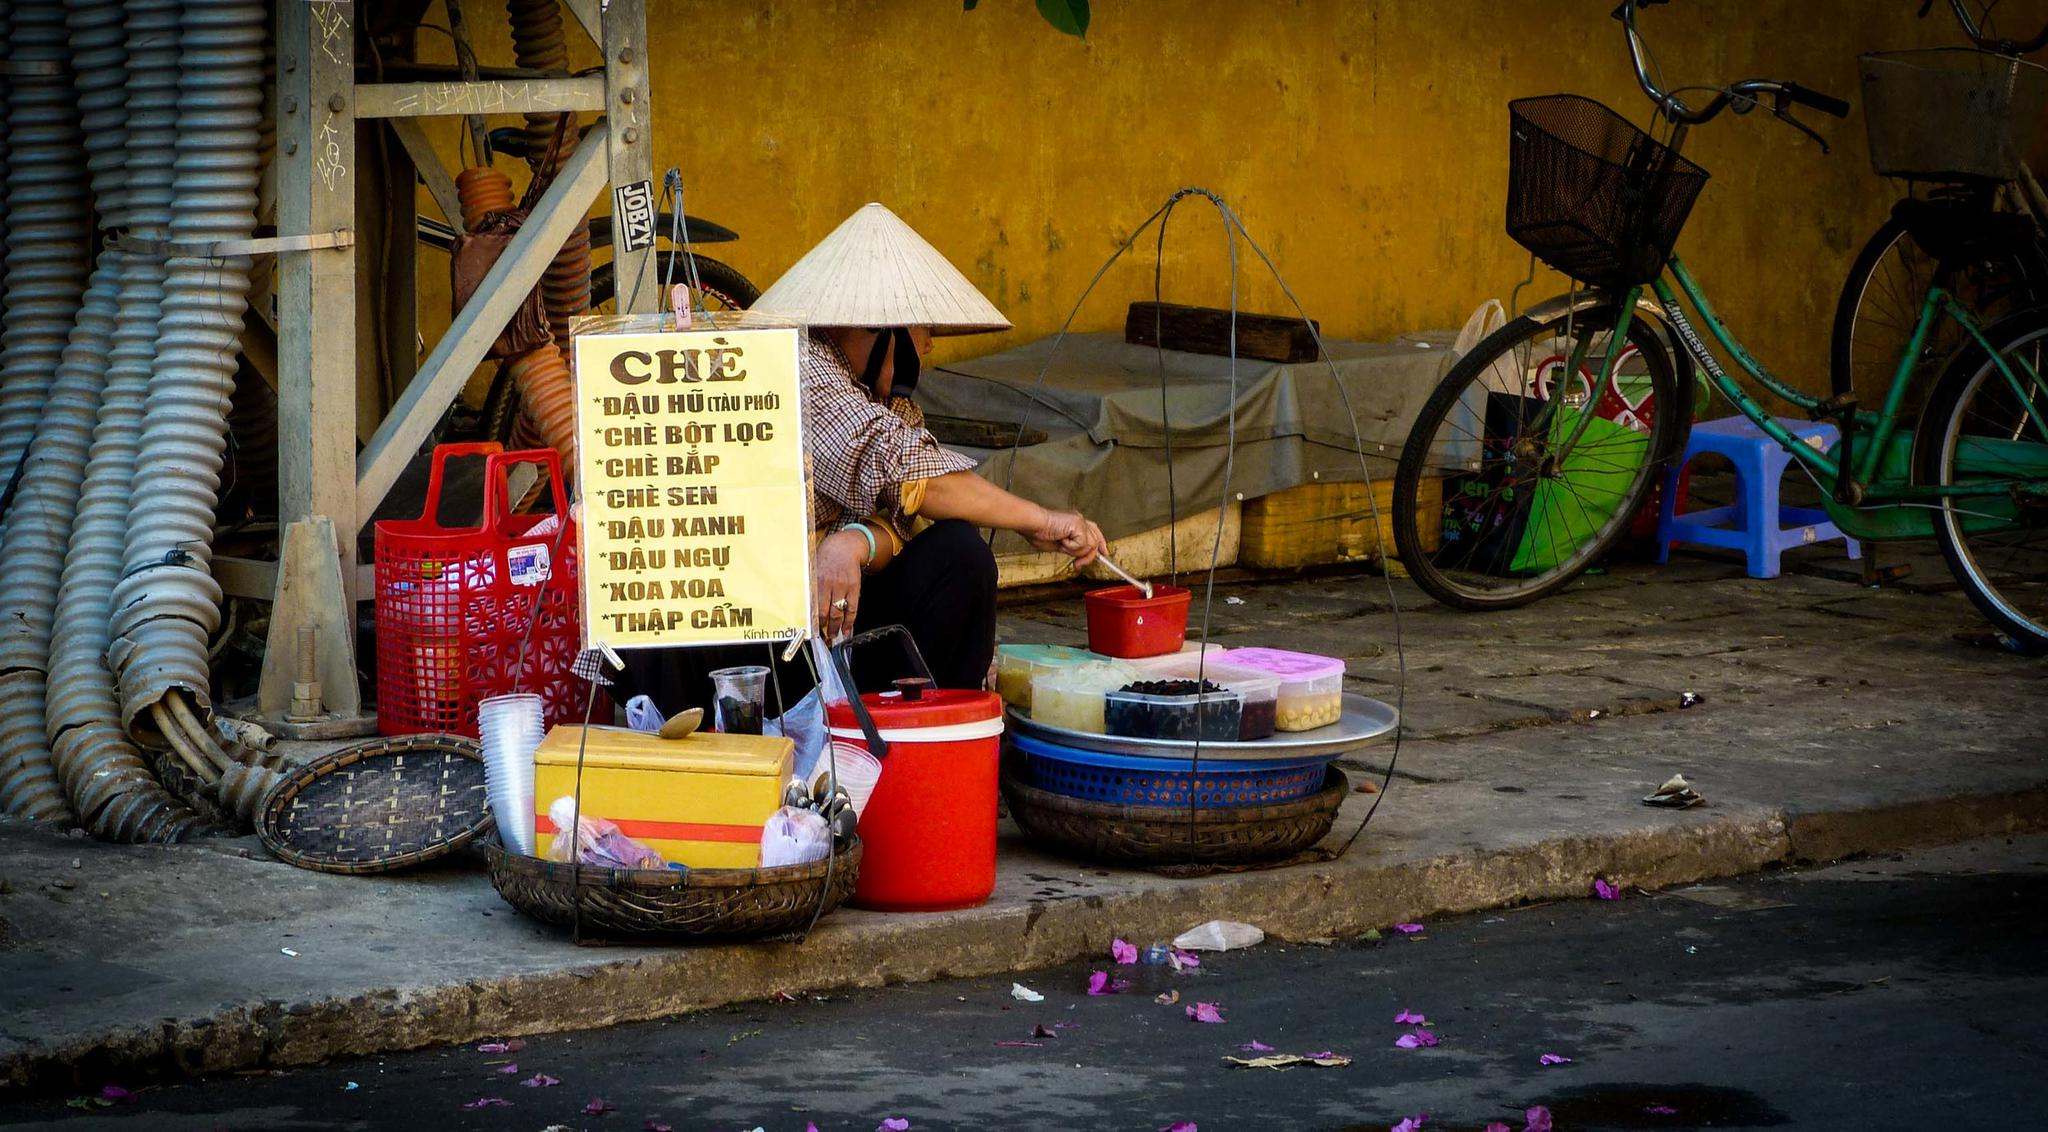 Street vendor in Hoi An